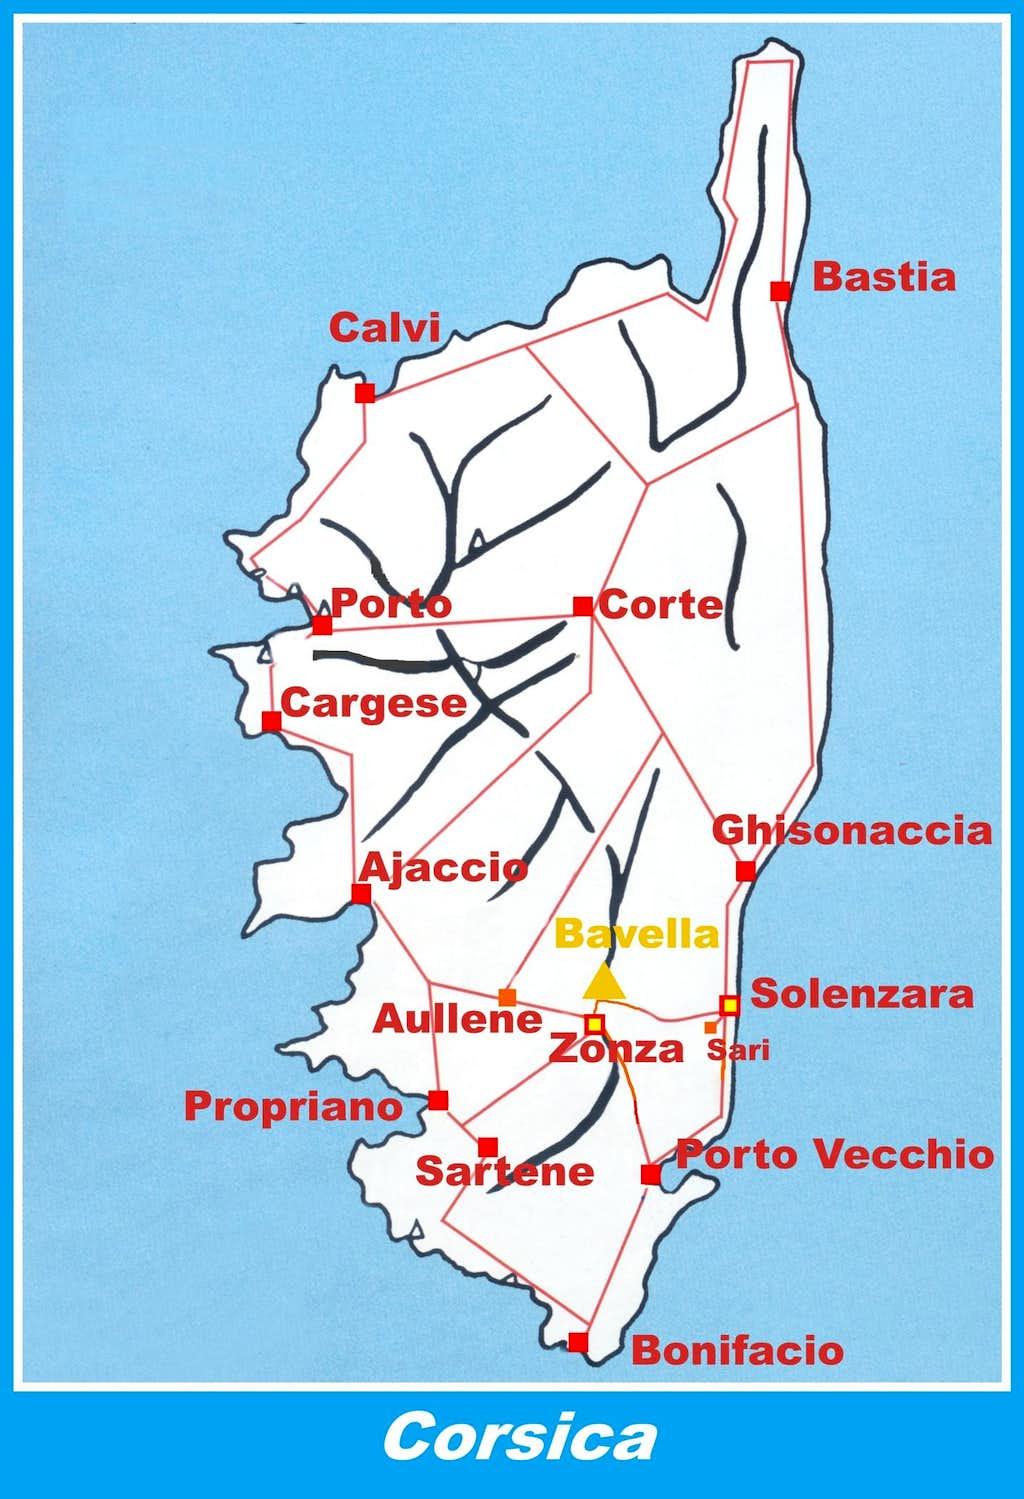 Corsica road map : Photos, Diagrams & Topos : SummitPost